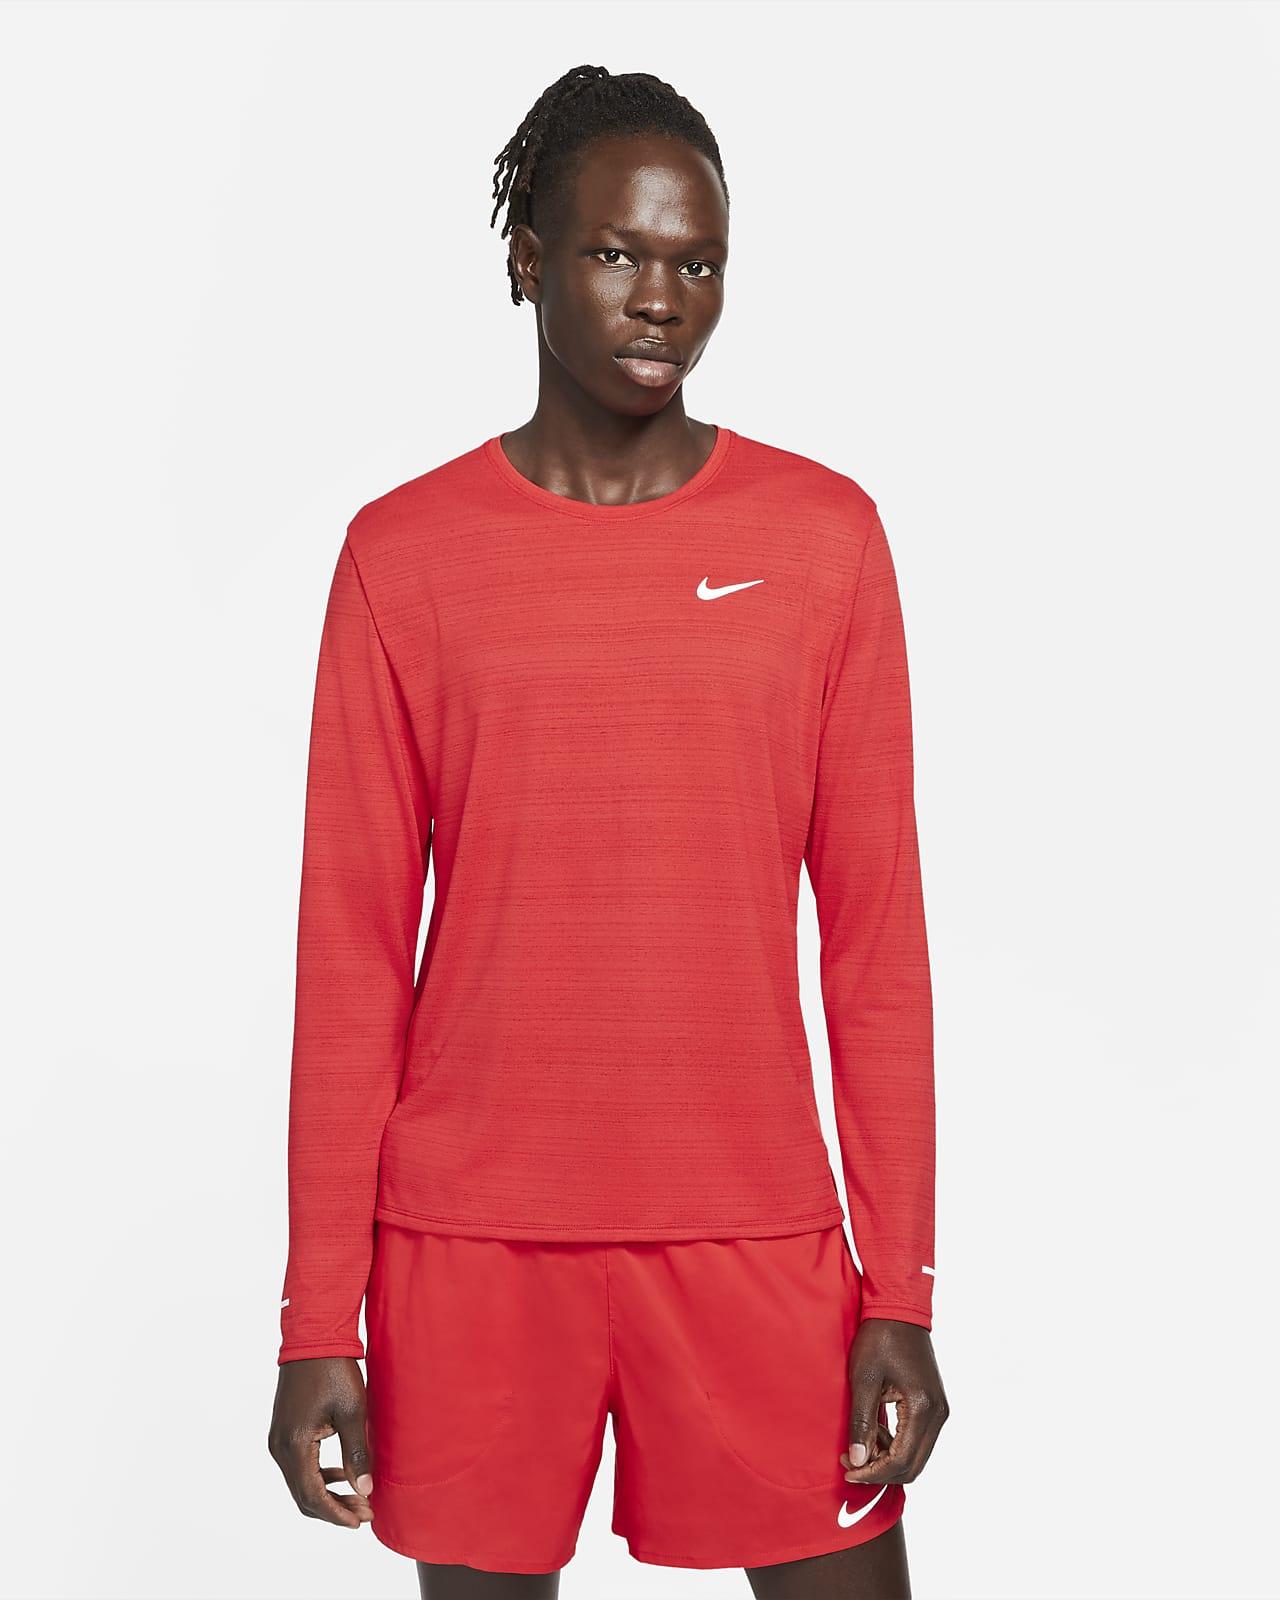 Nike Dri-FIT Miler Men's Long-Sleeve Running Top